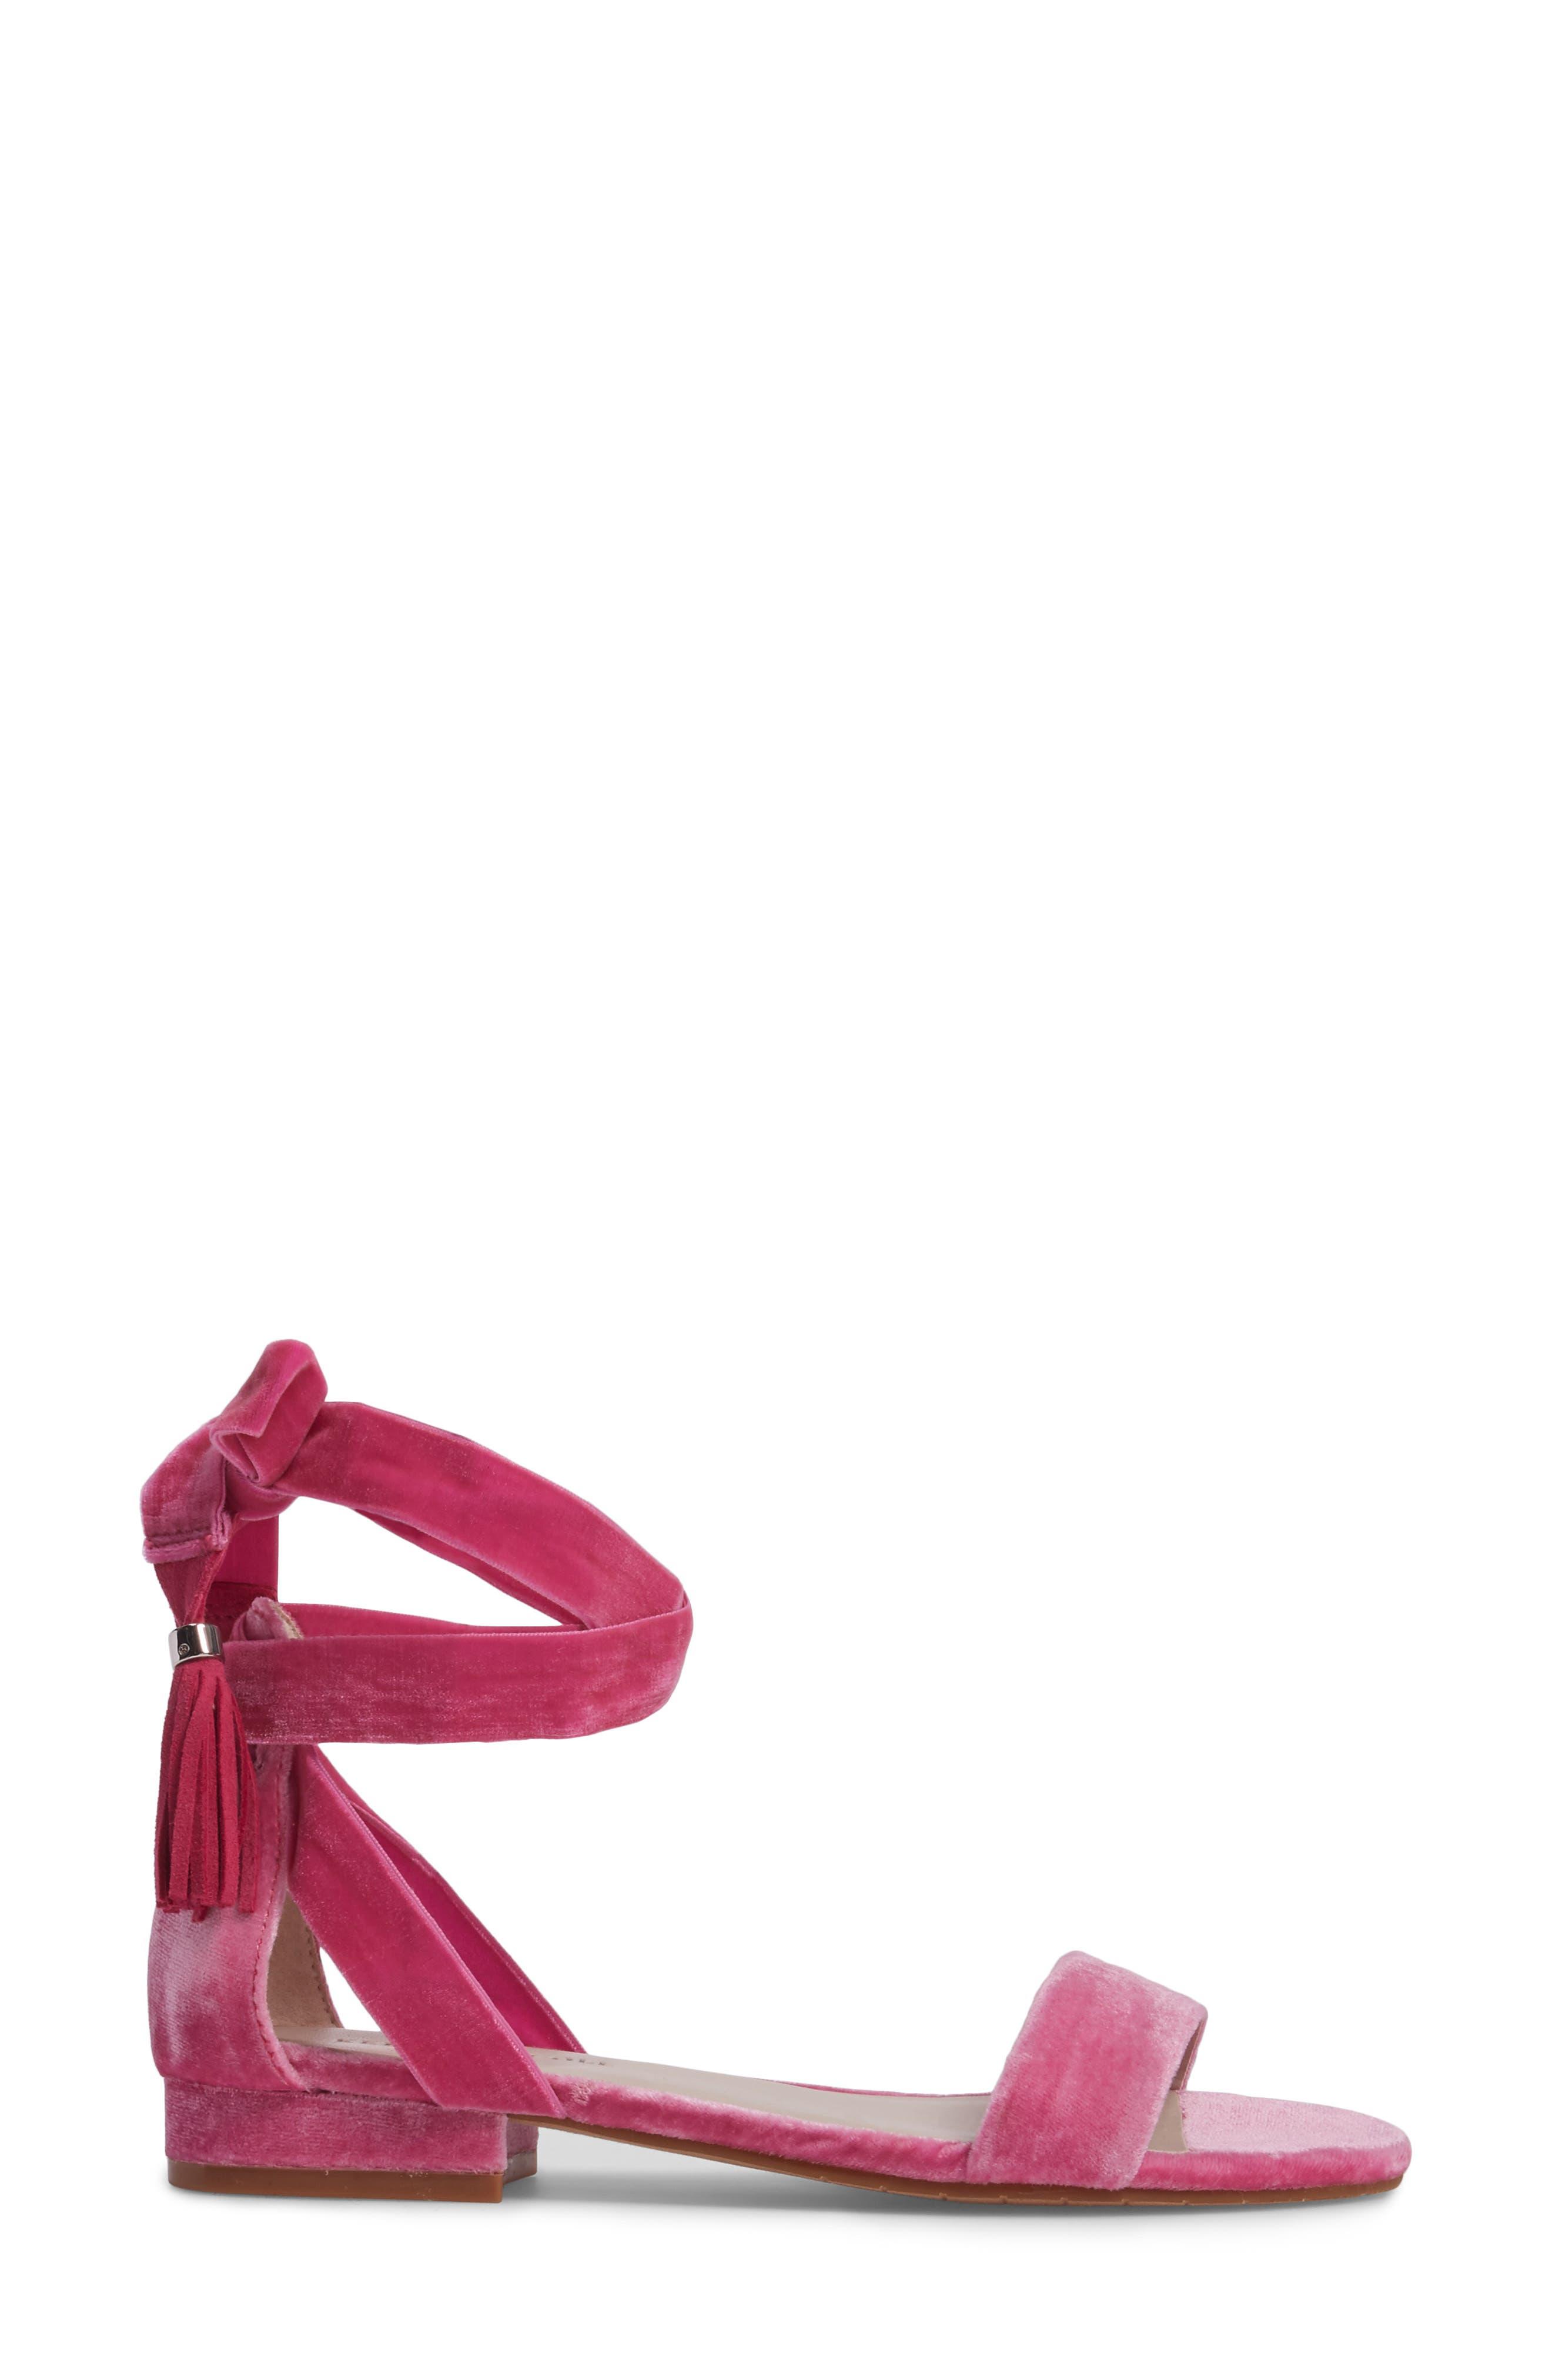 Valen Tassel Lace-Up Sandal,                             Alternate thumbnail 40, color,